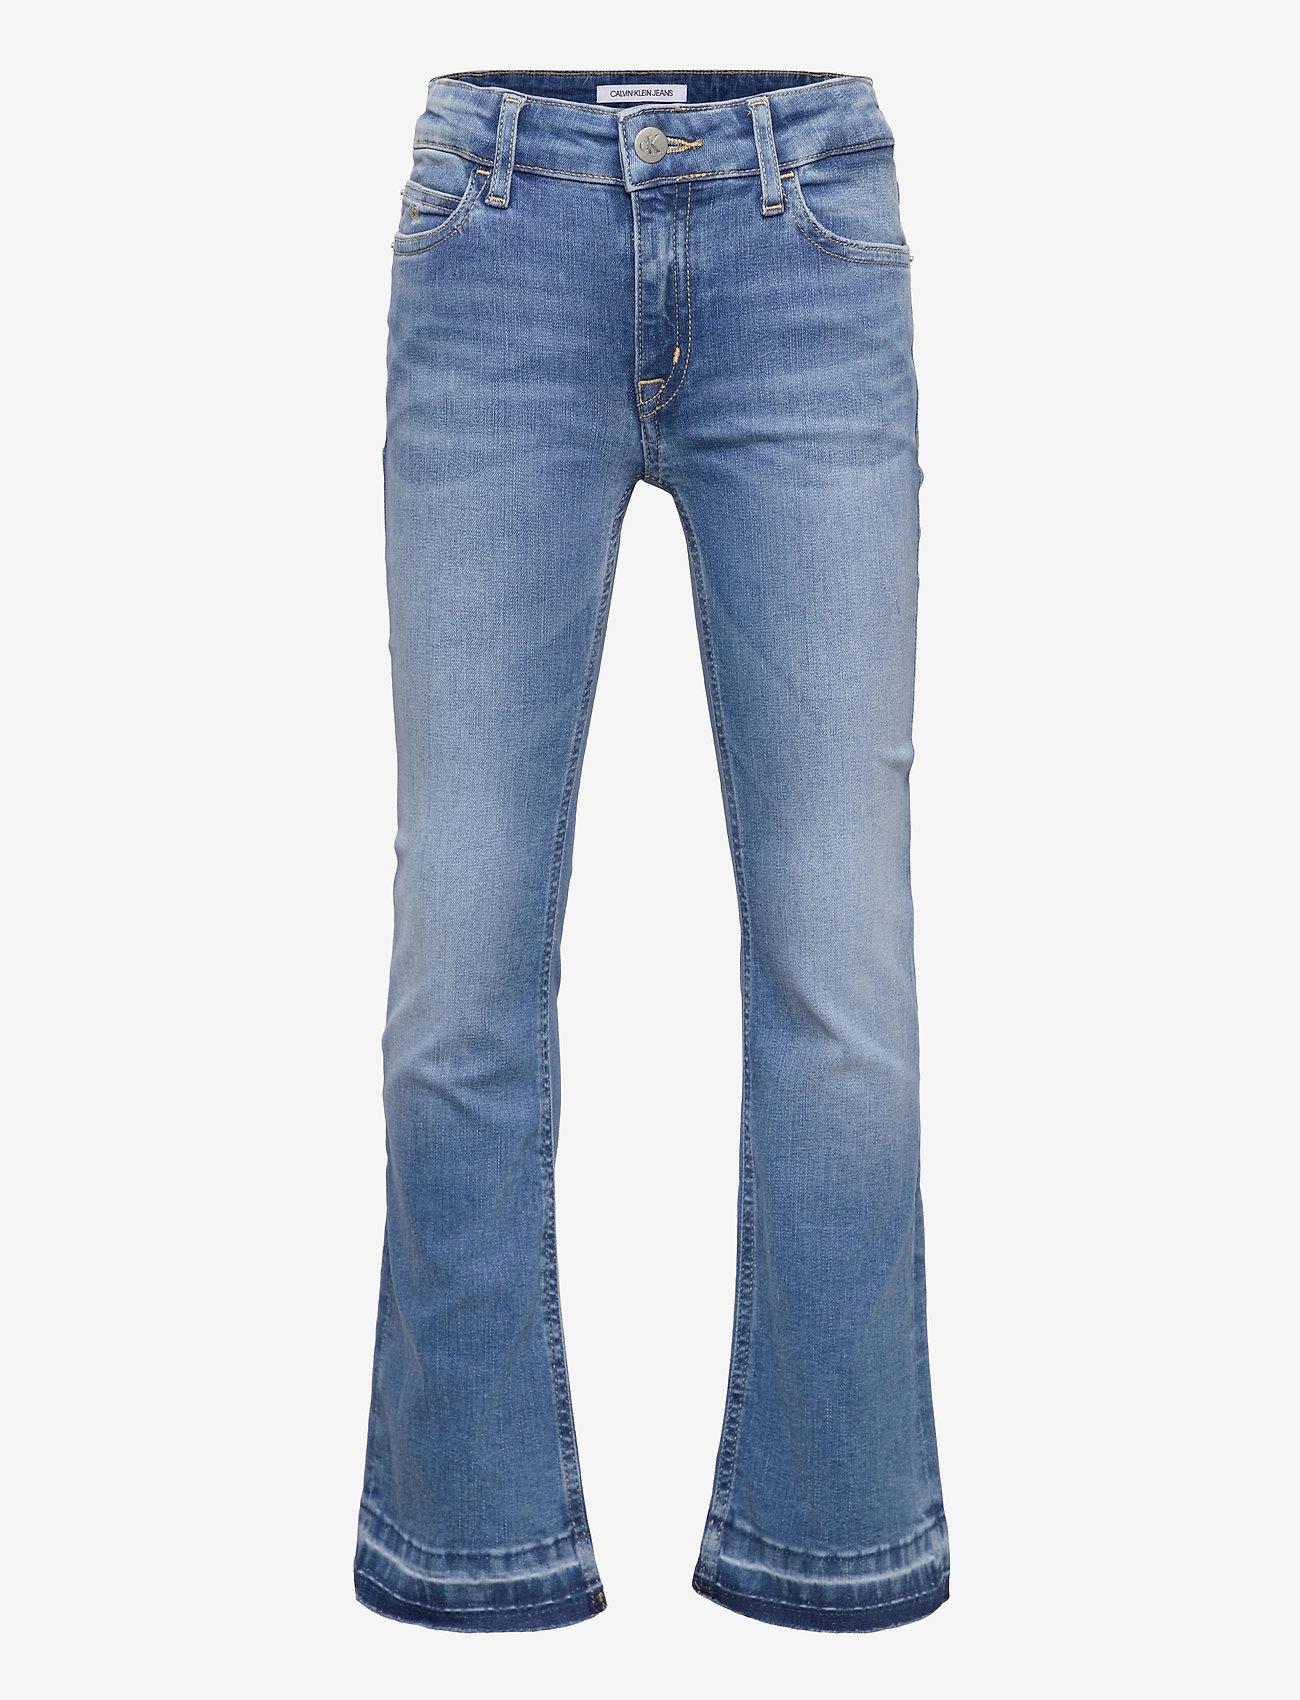 Calvin Klein - FLARE MR INFINITE LIGHT BL STR - jeans - infinite light blue stretch - 0